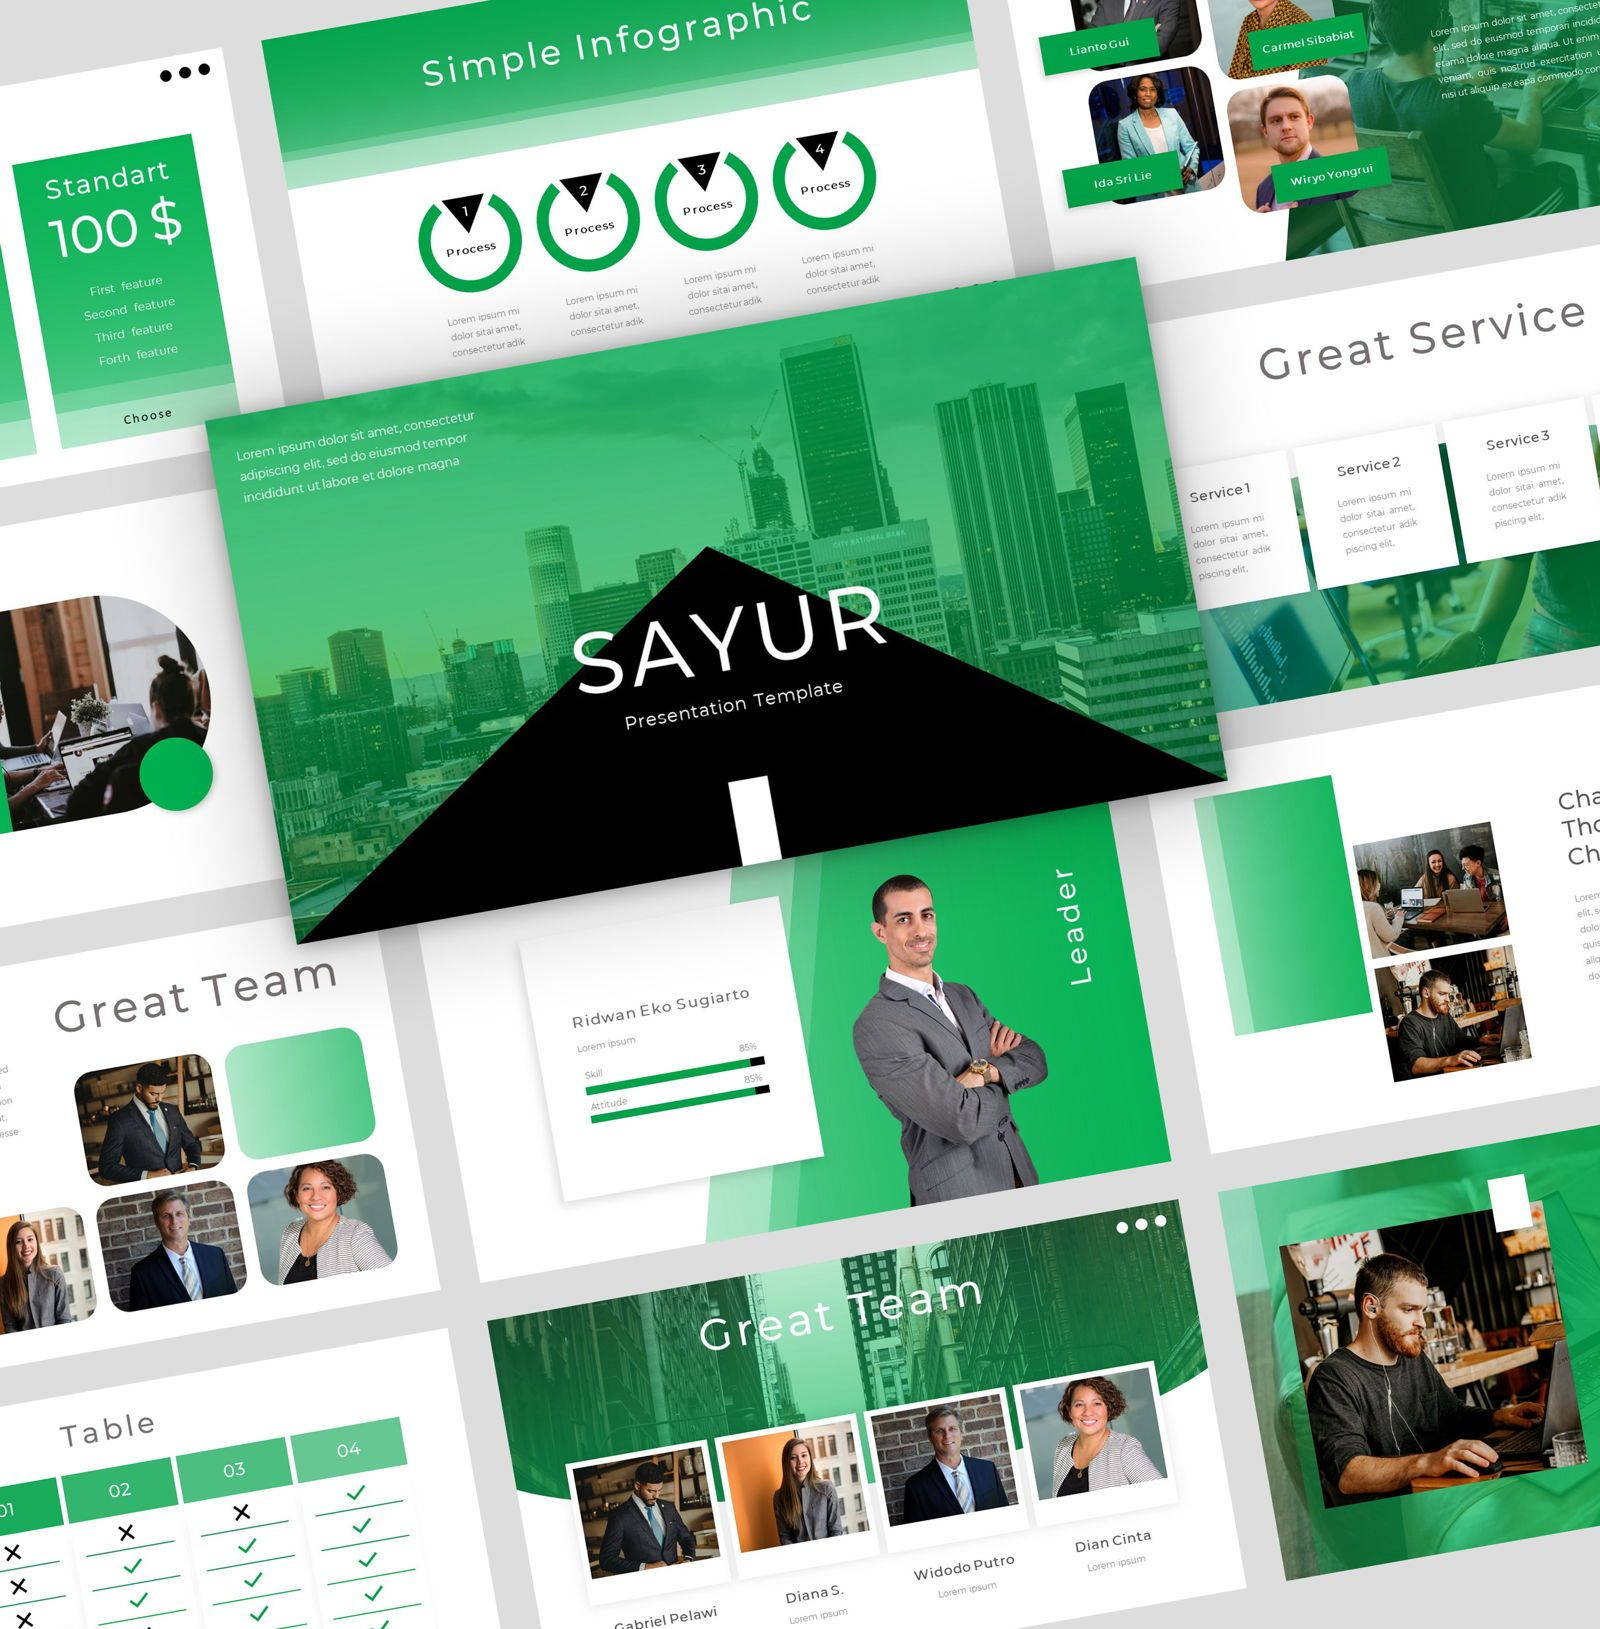 sayur - PowerPoint Presentation Template, 08073, Presentation Templates — PoweredTemplate.com